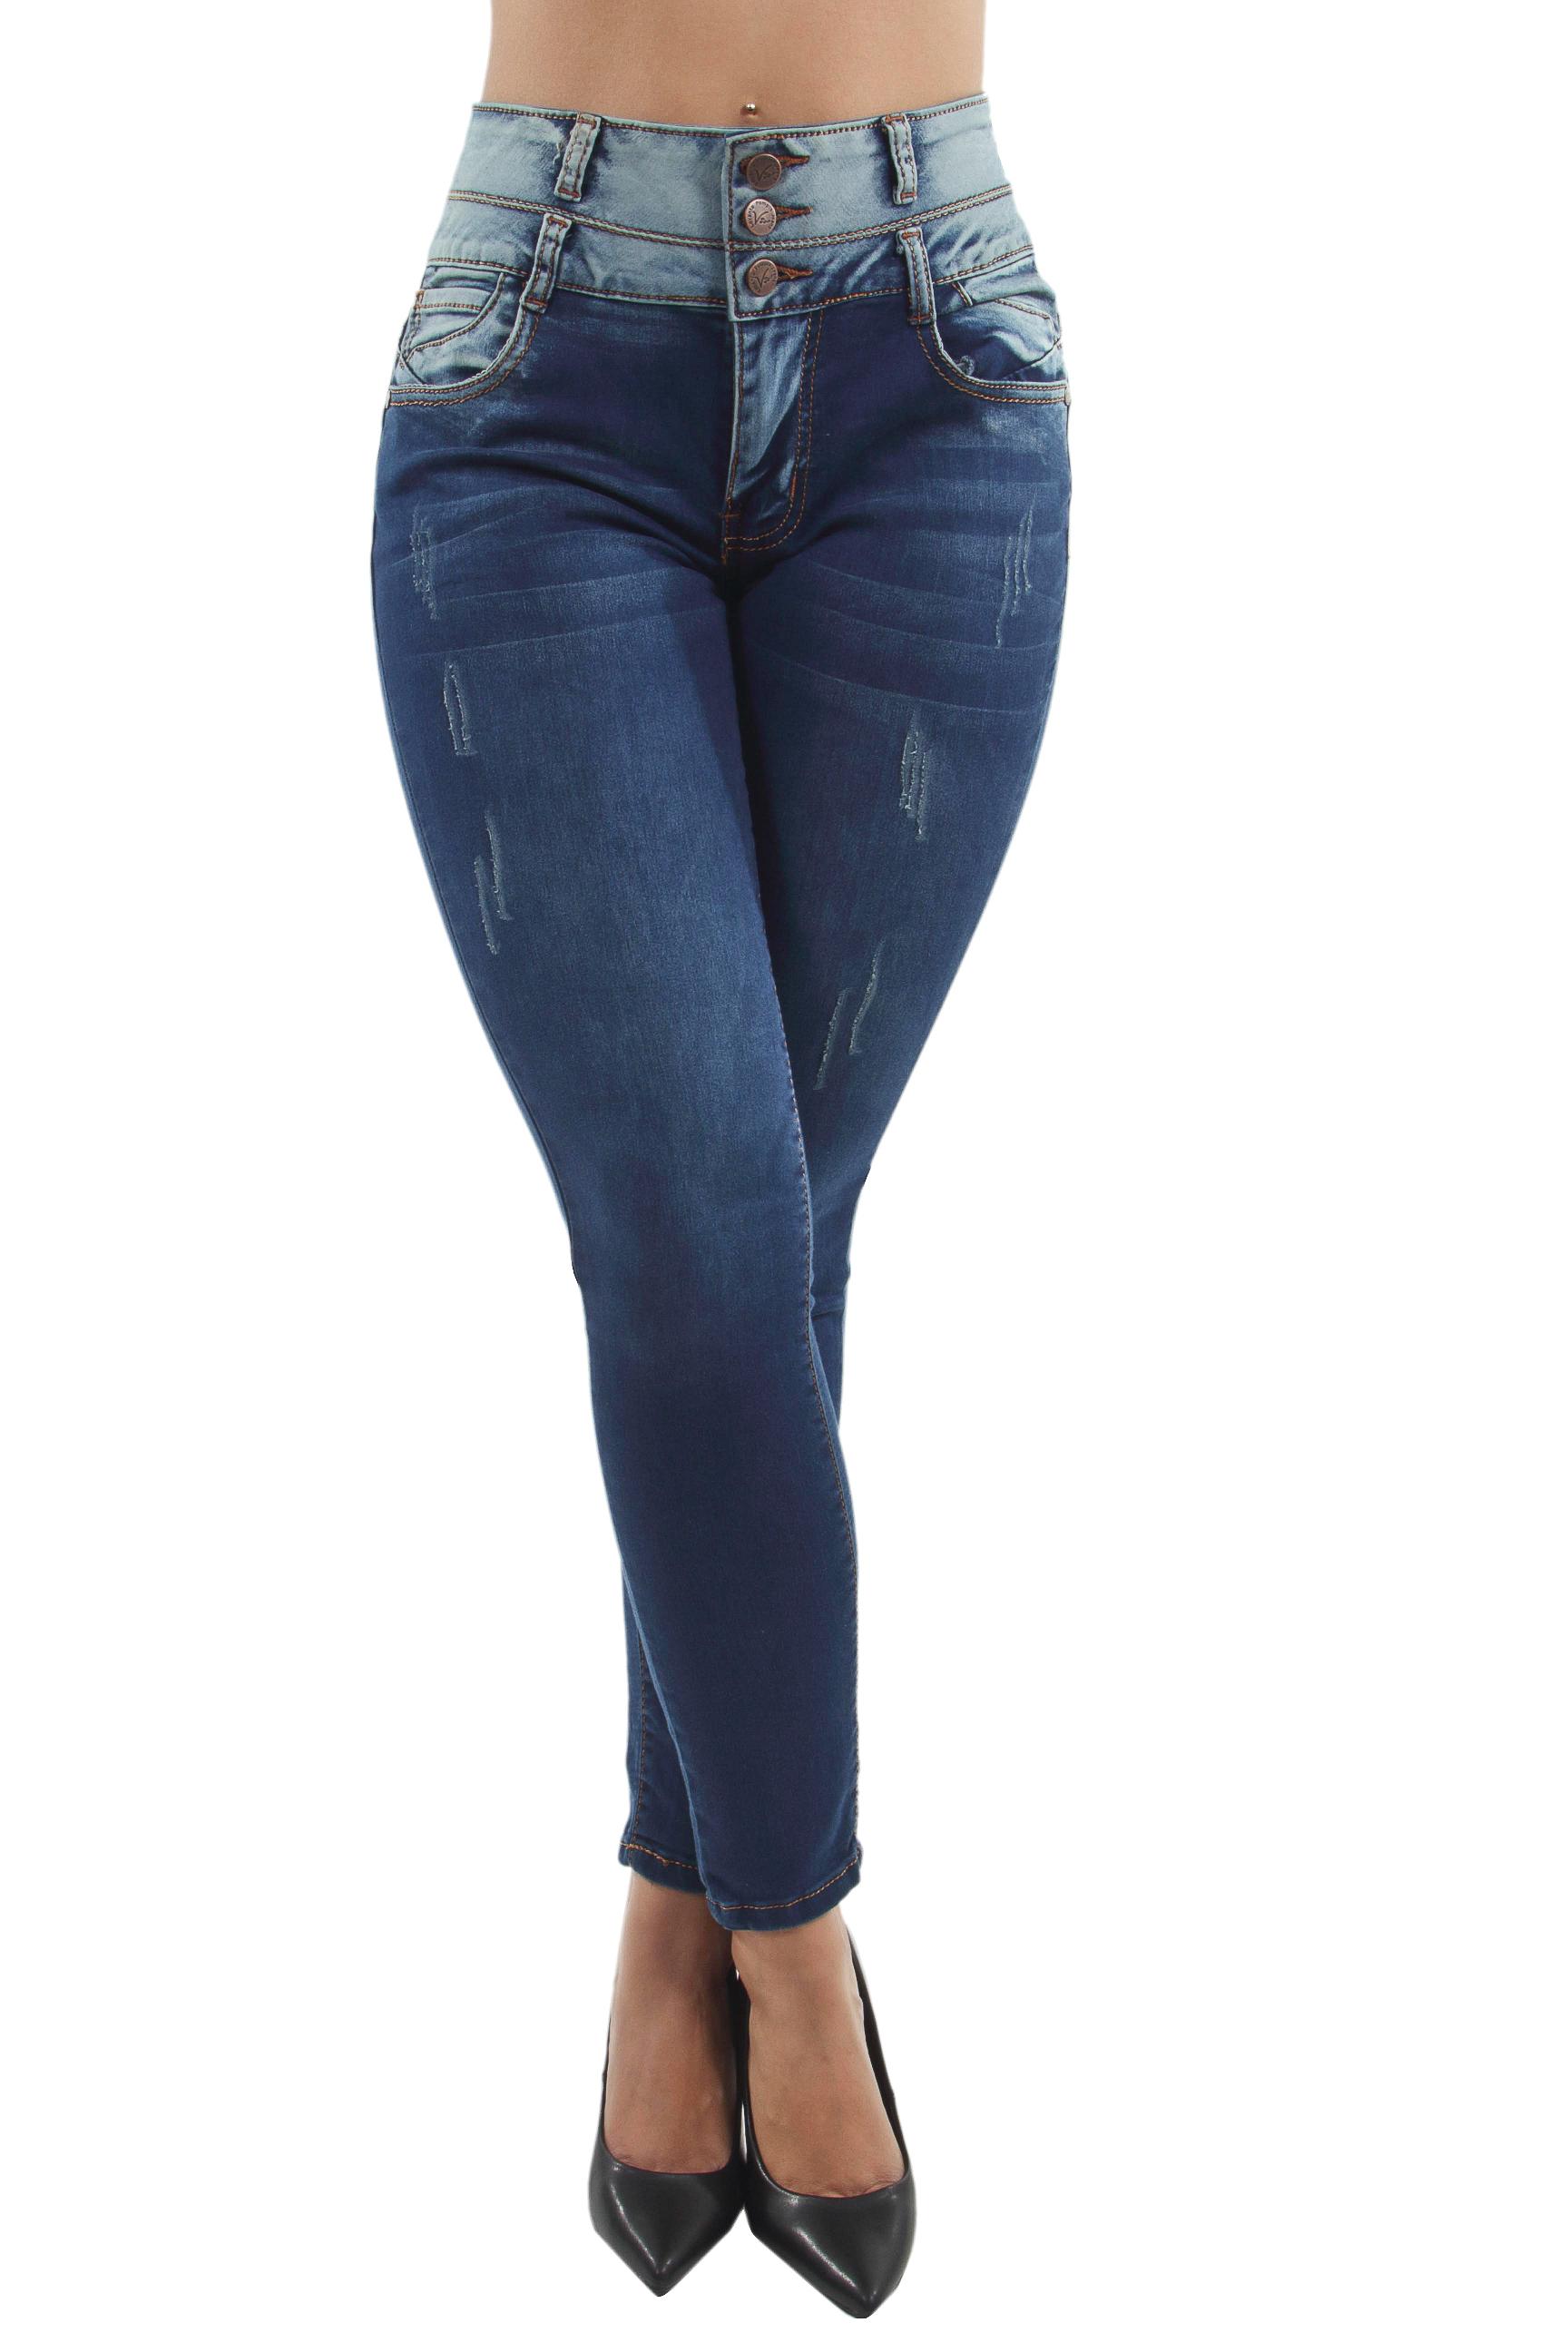 Women/'s Juniors Colombian Design Skinny Jeans Butt Lift Mid Waist Push Up